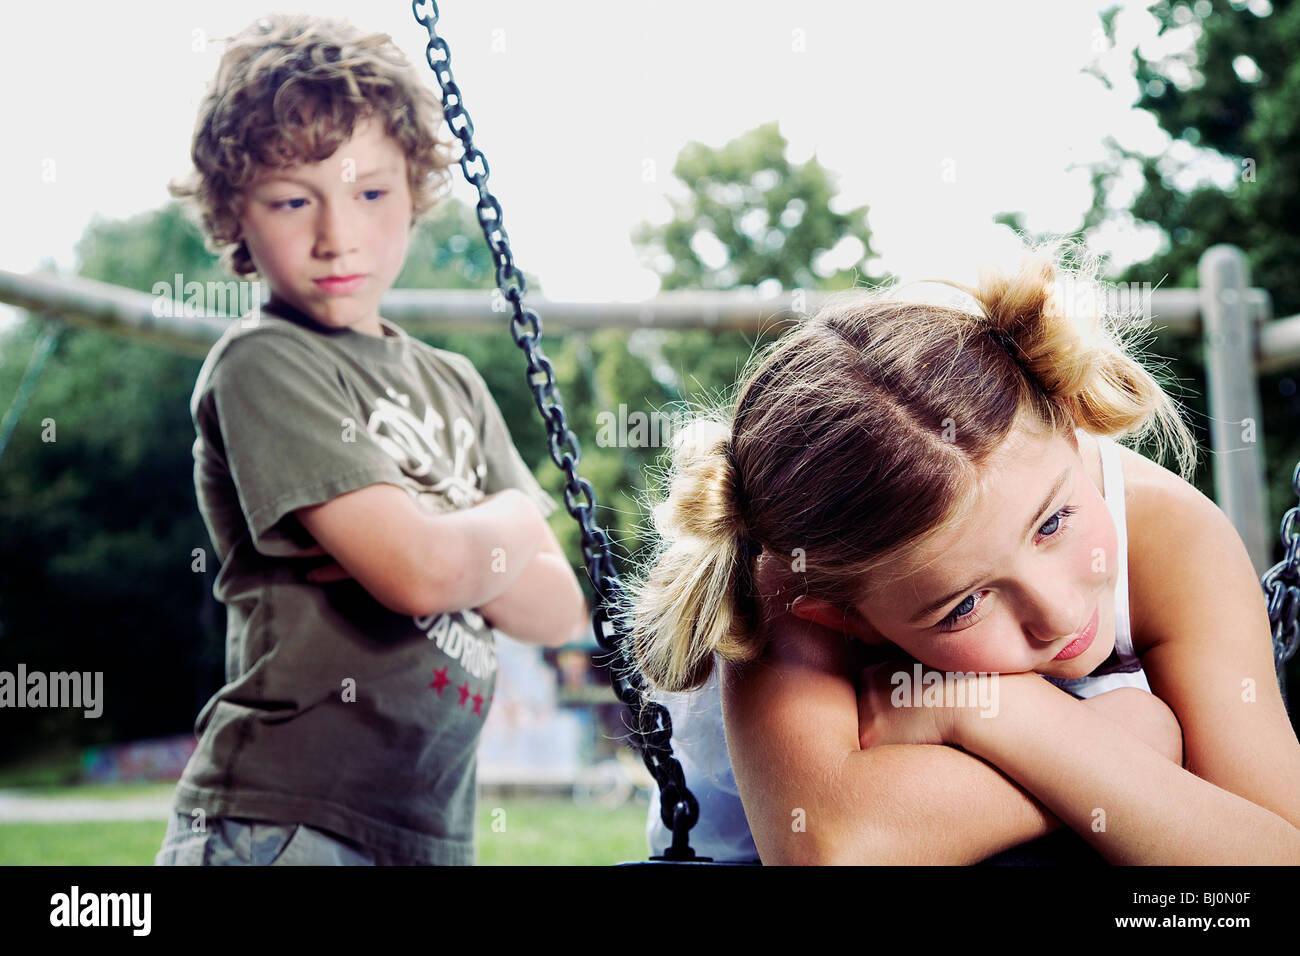 young boy watching sad girl at playground stock photo 28290655 alamy